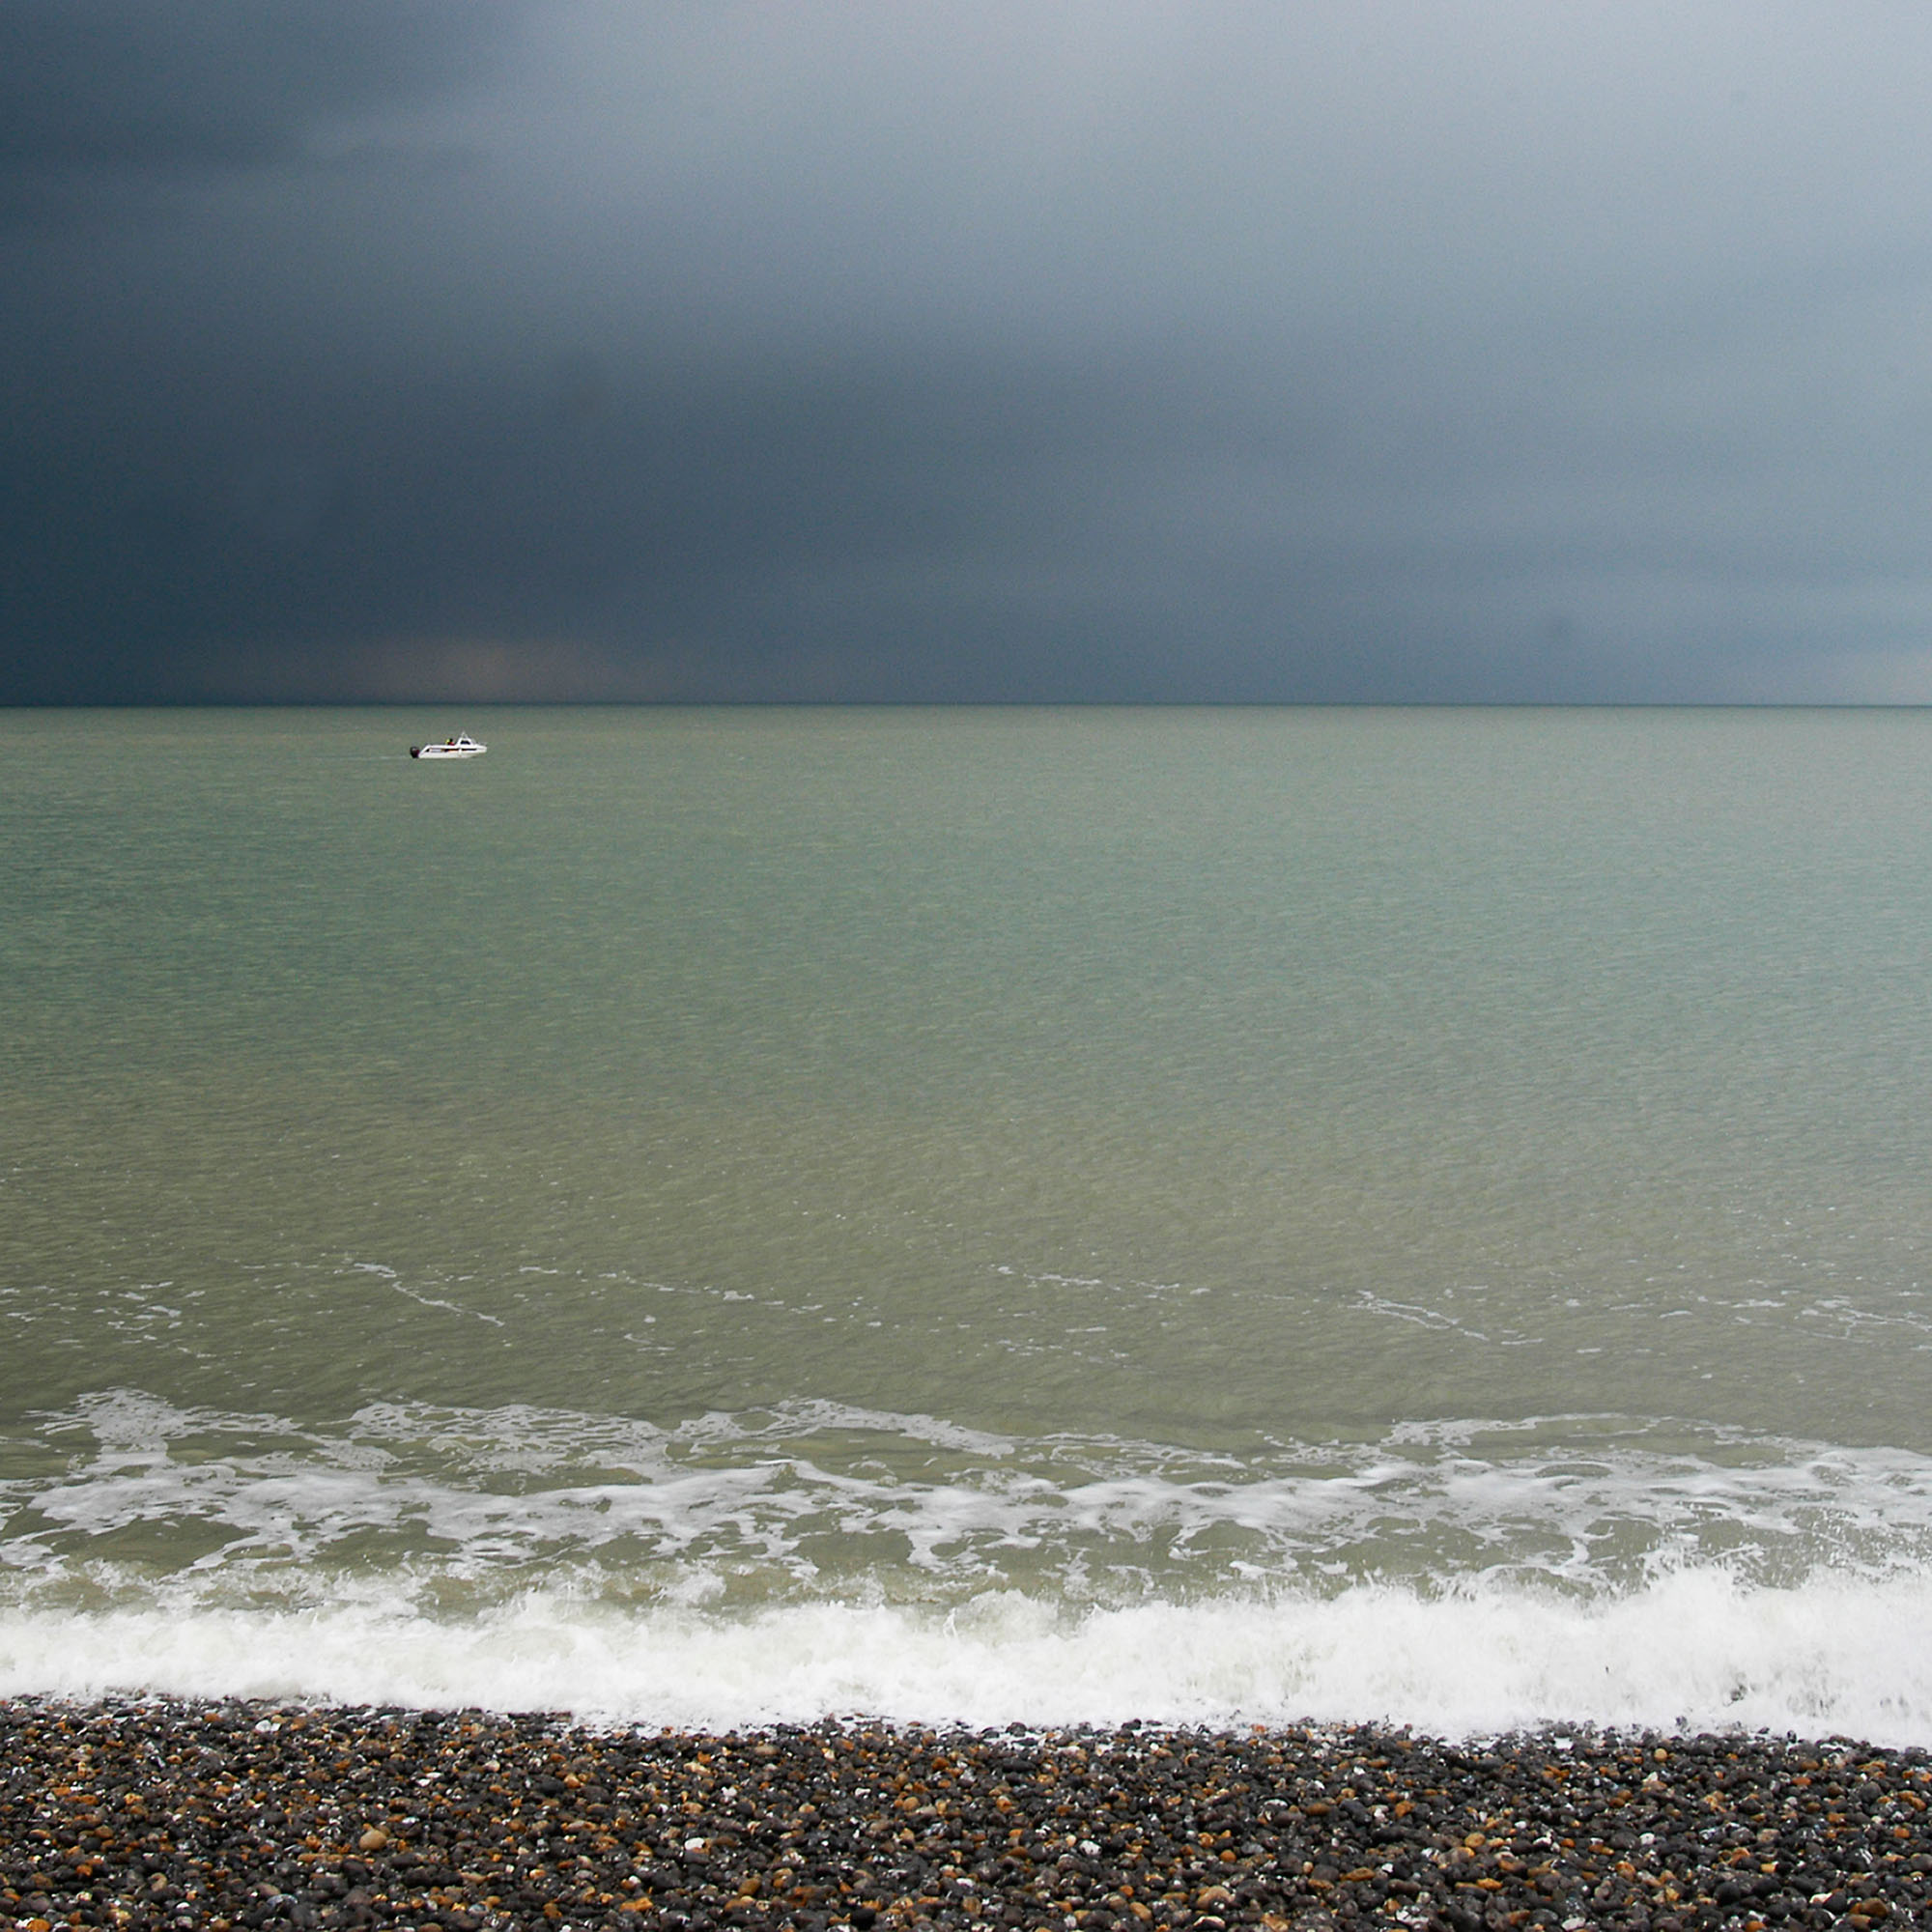 lone boat - sussex coast.jpg